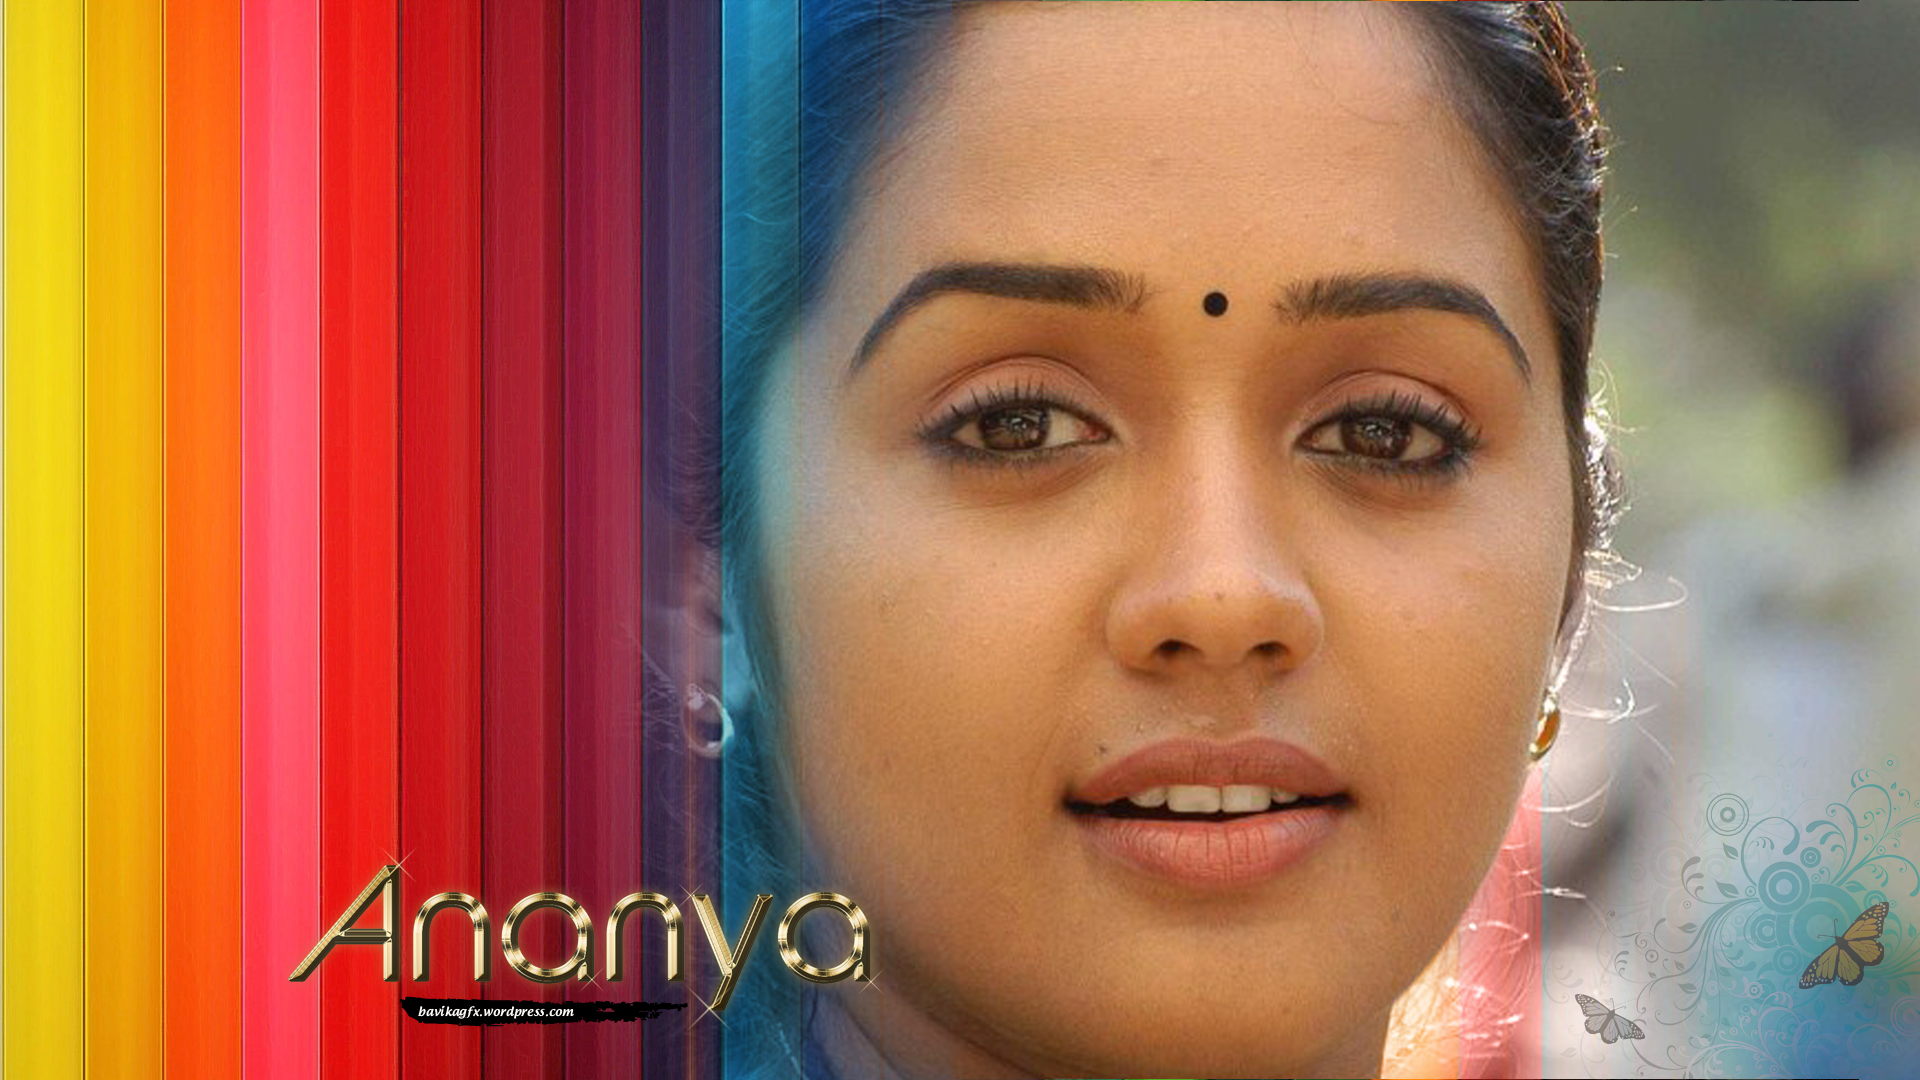 Actress Hd Wallpapers Hd Wallpapers: Tamil Actress HD Wallpapers